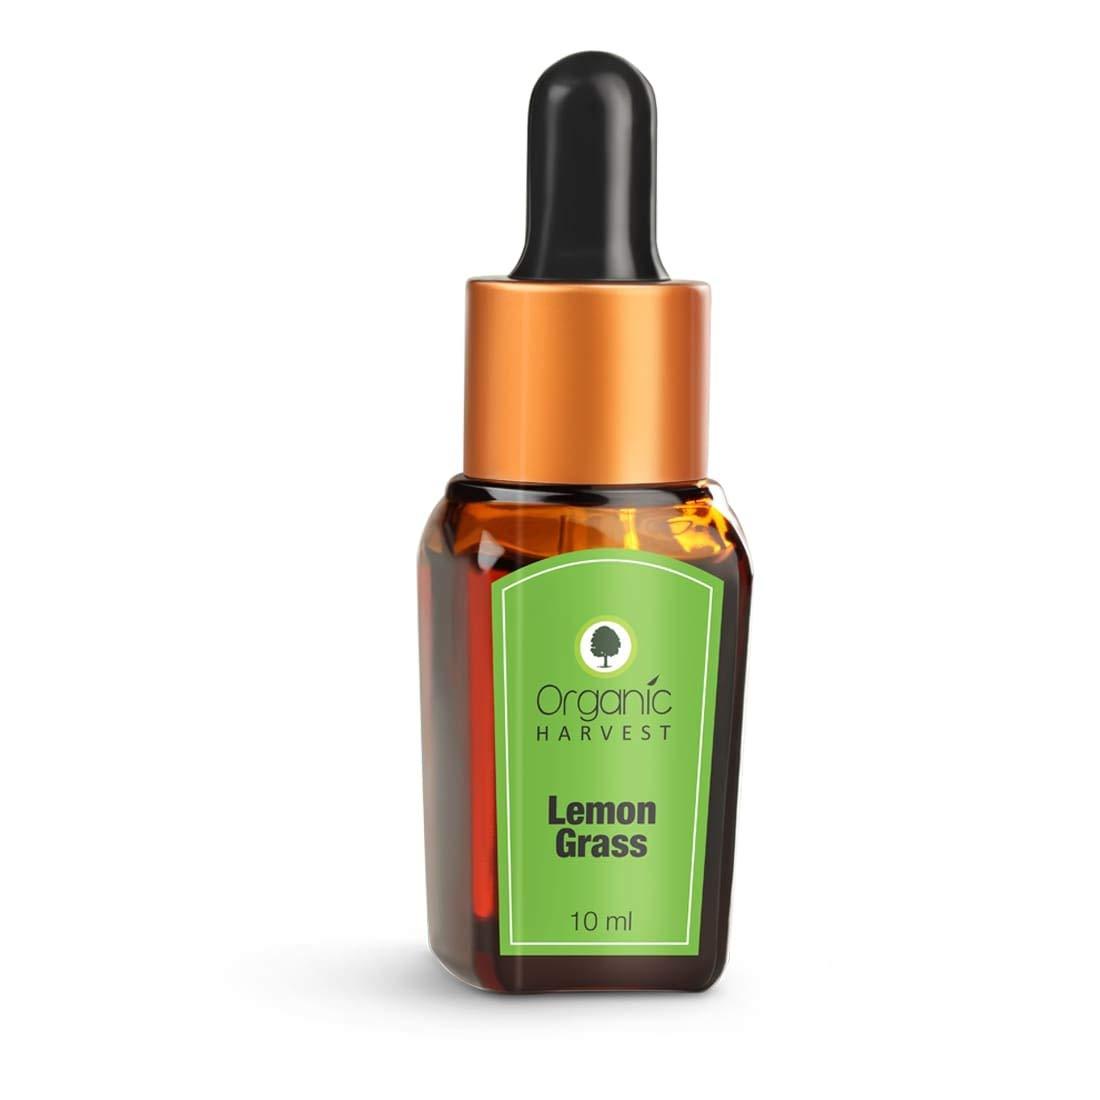 Organic Harvest | Lemon Grass Essential Oil - 10ml